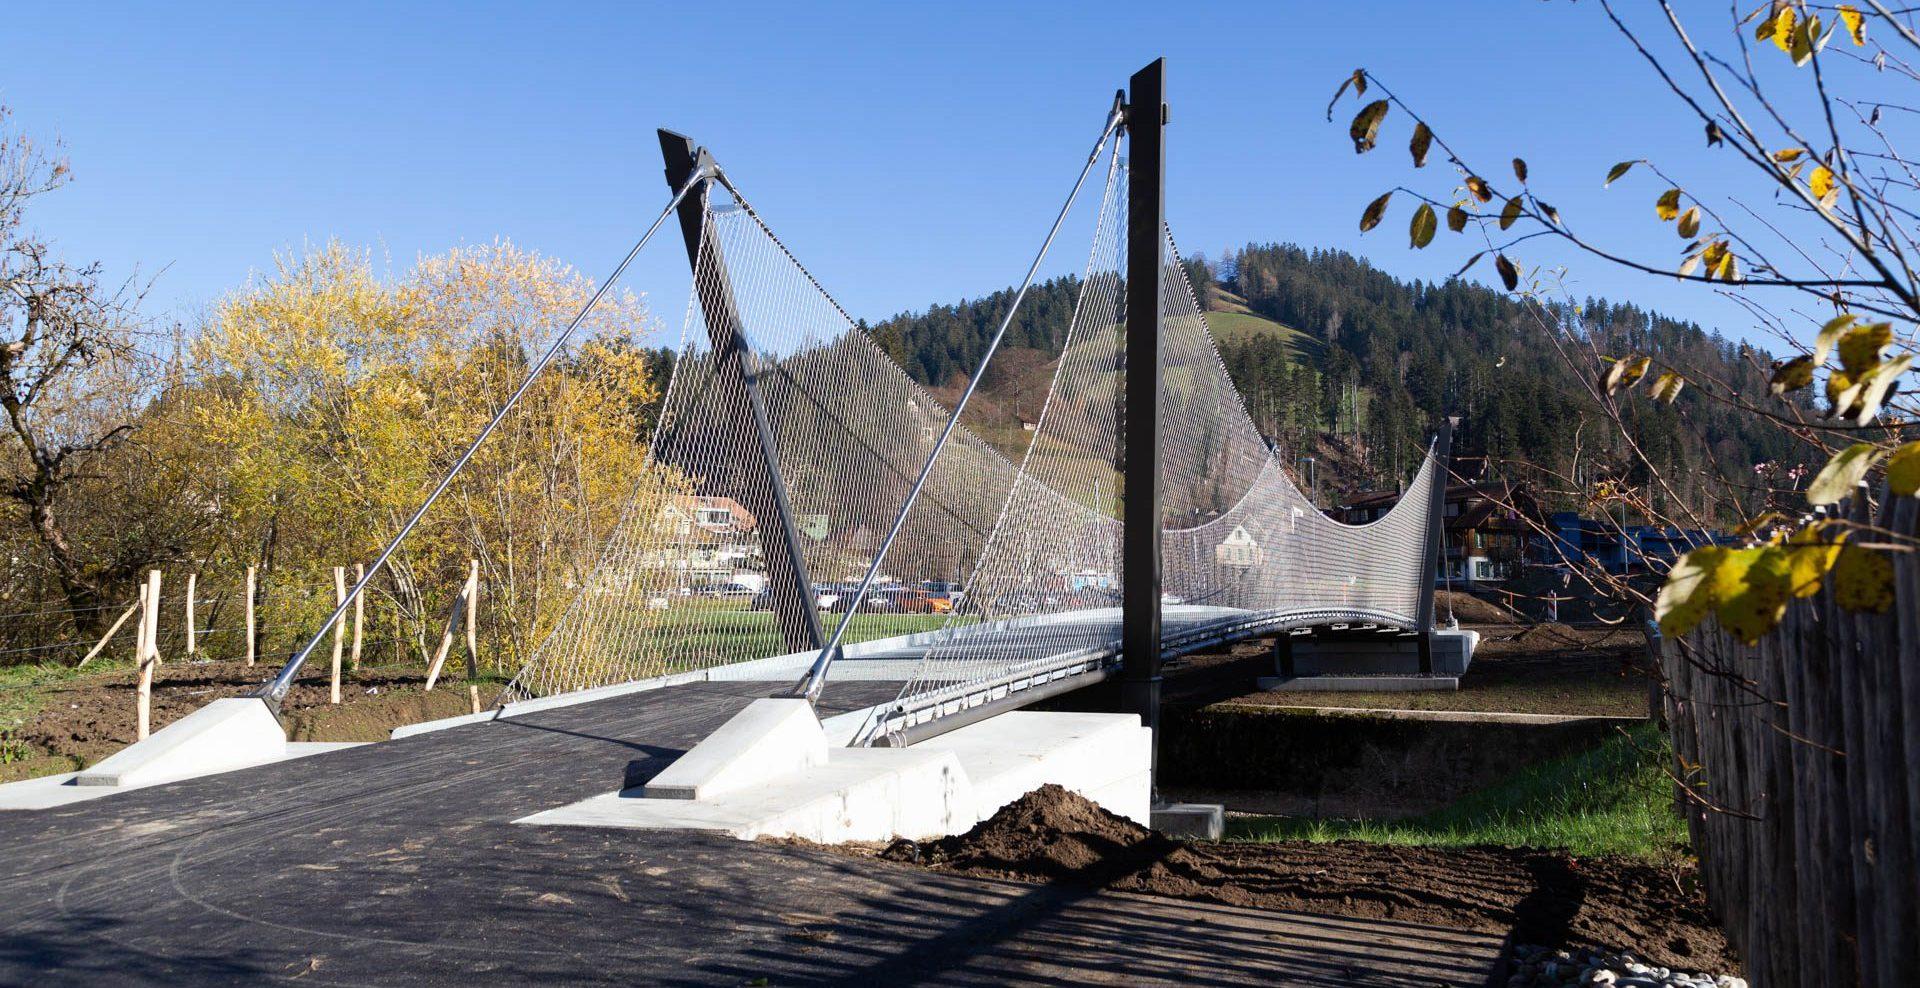 <<The Himmelhaus bridge over the river Trub in Trubschachen>>